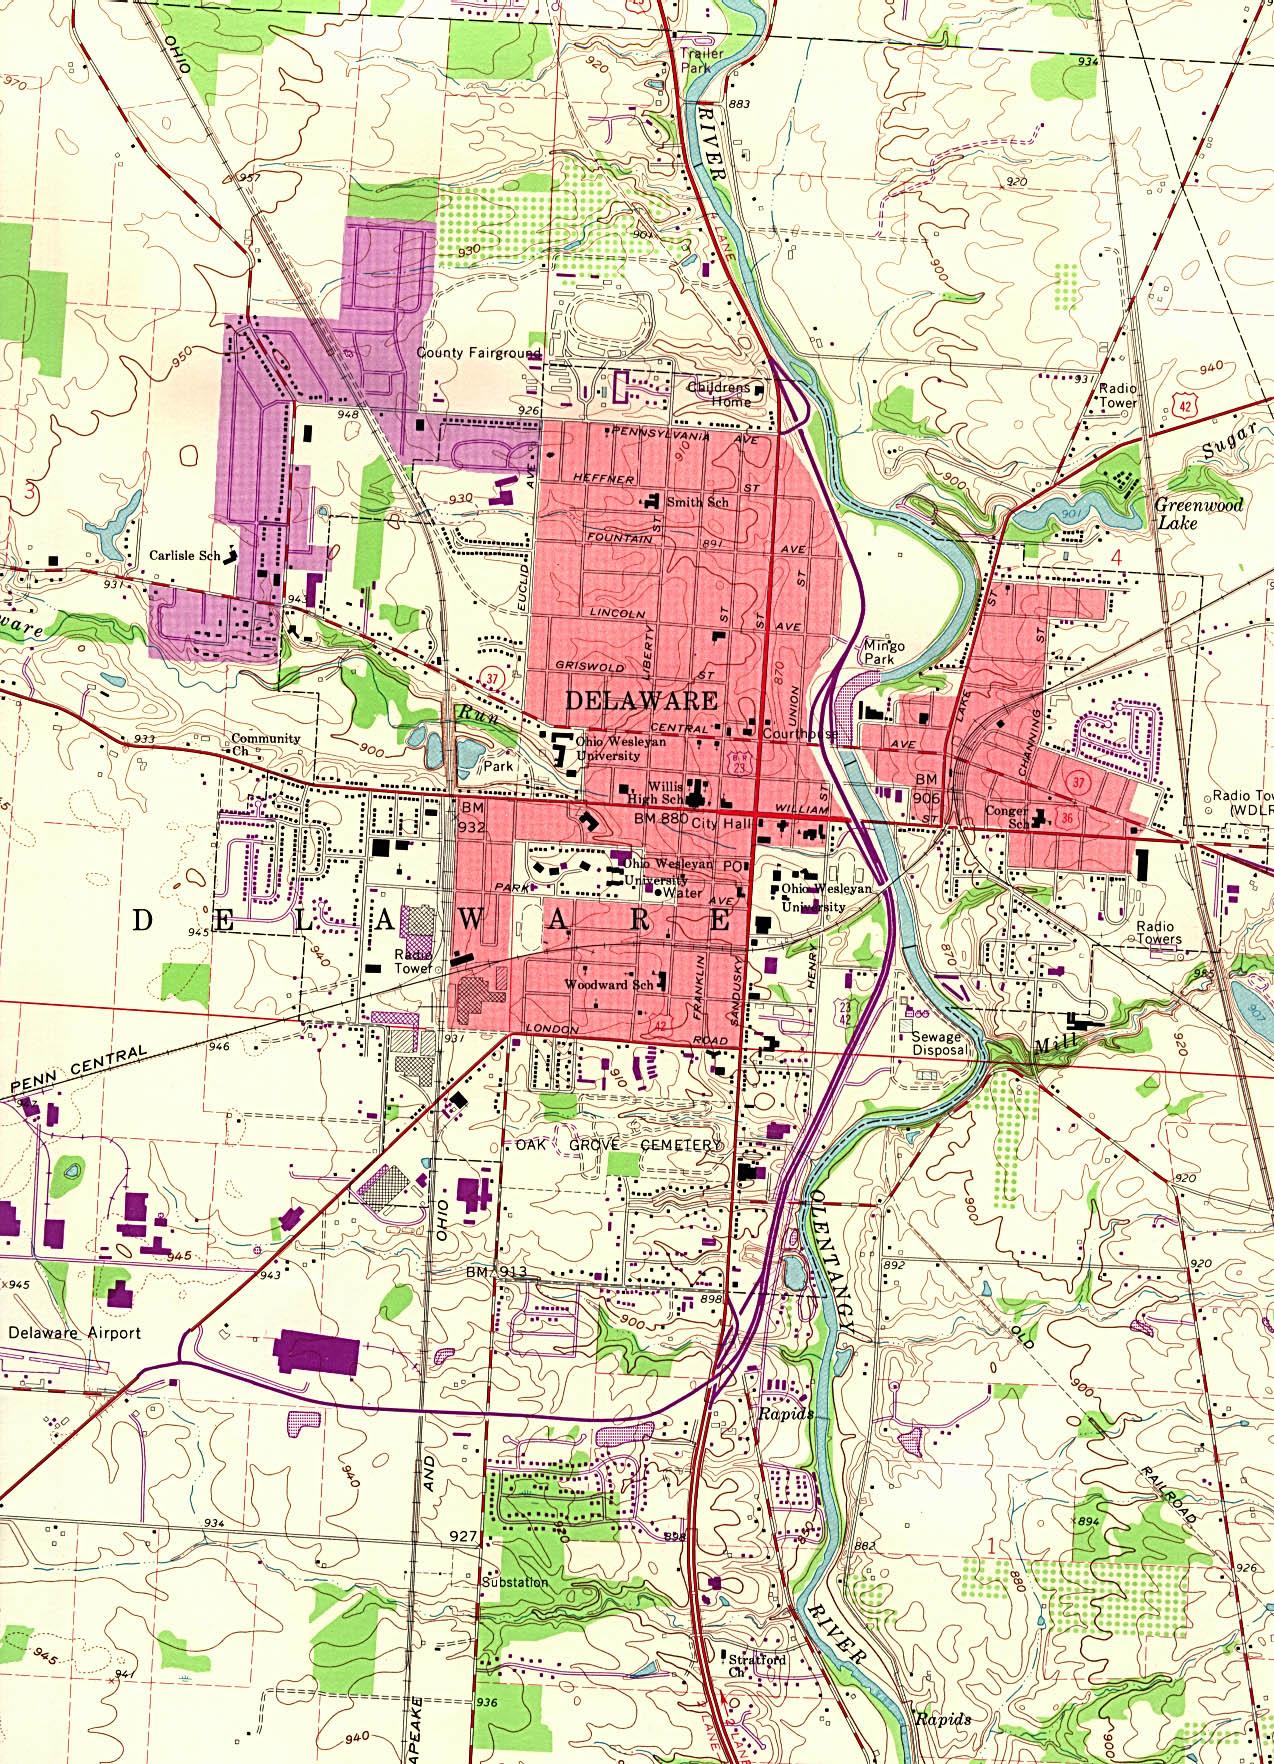 Delaware Topographic City Map, Ohio, United States